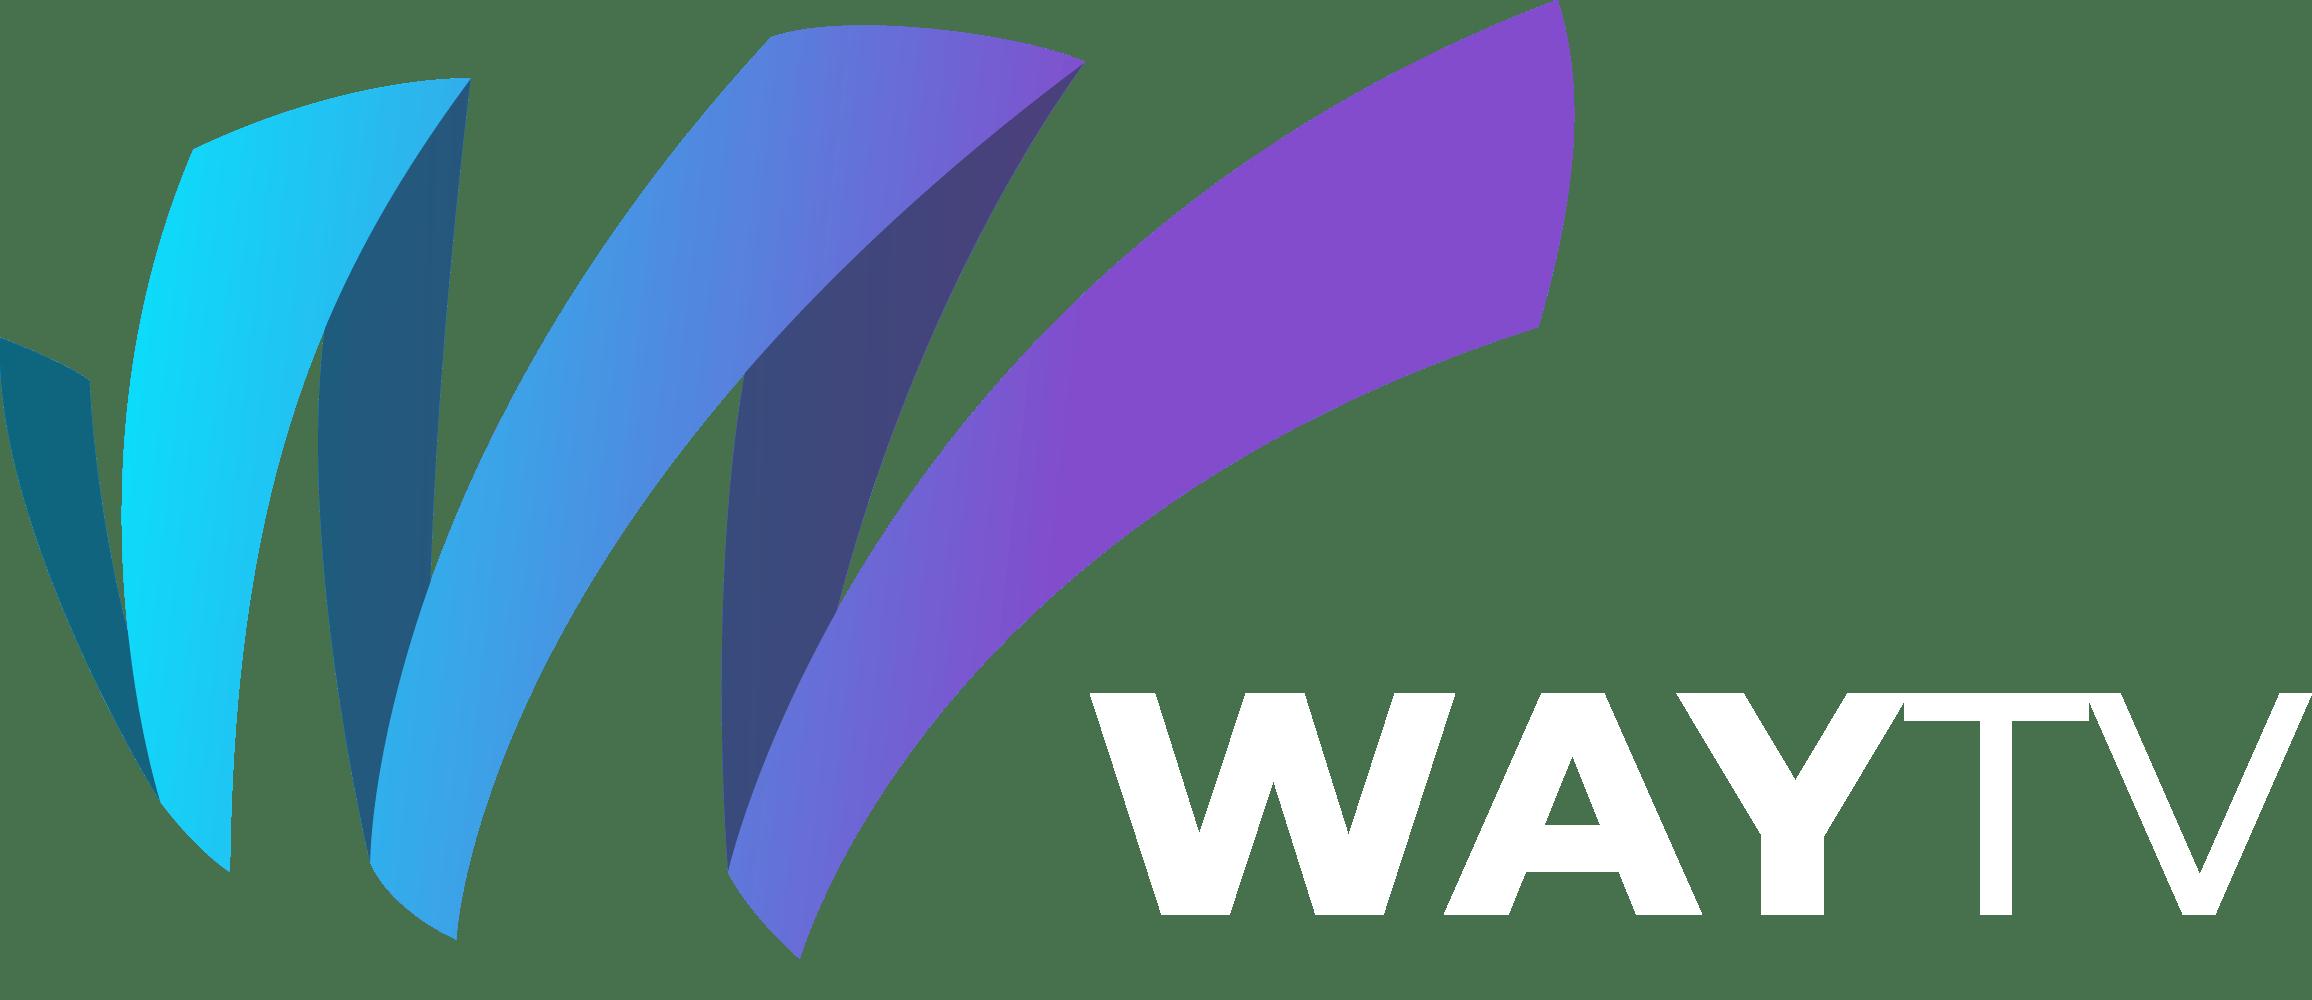 WAY TV